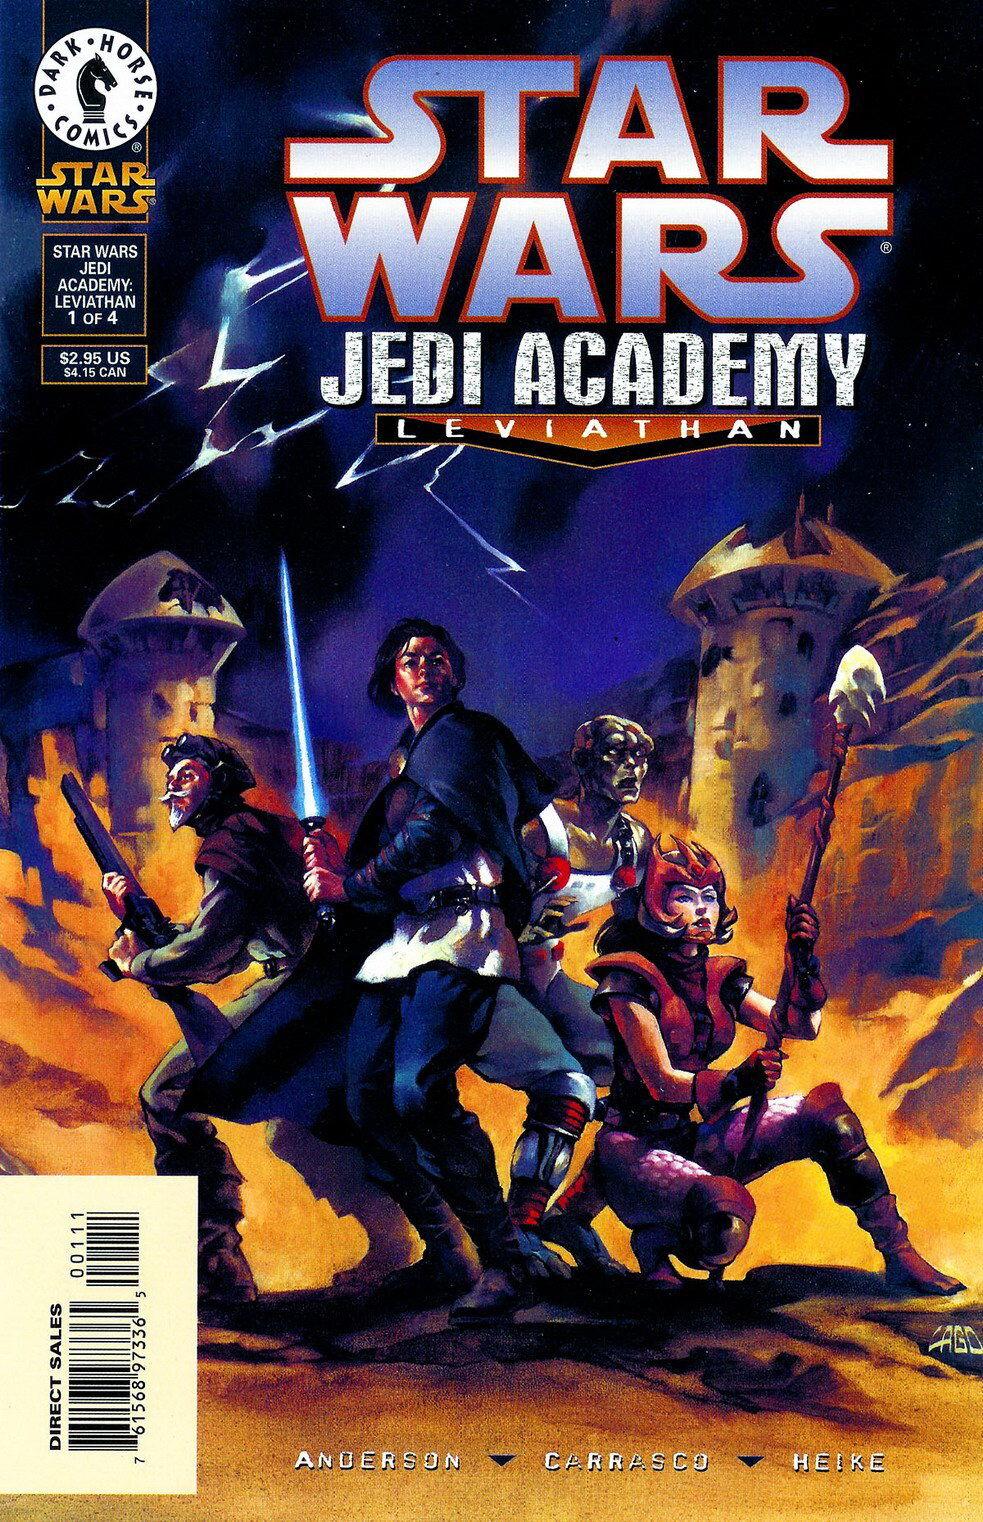 Star Wars Jedi Academy: Leviathan